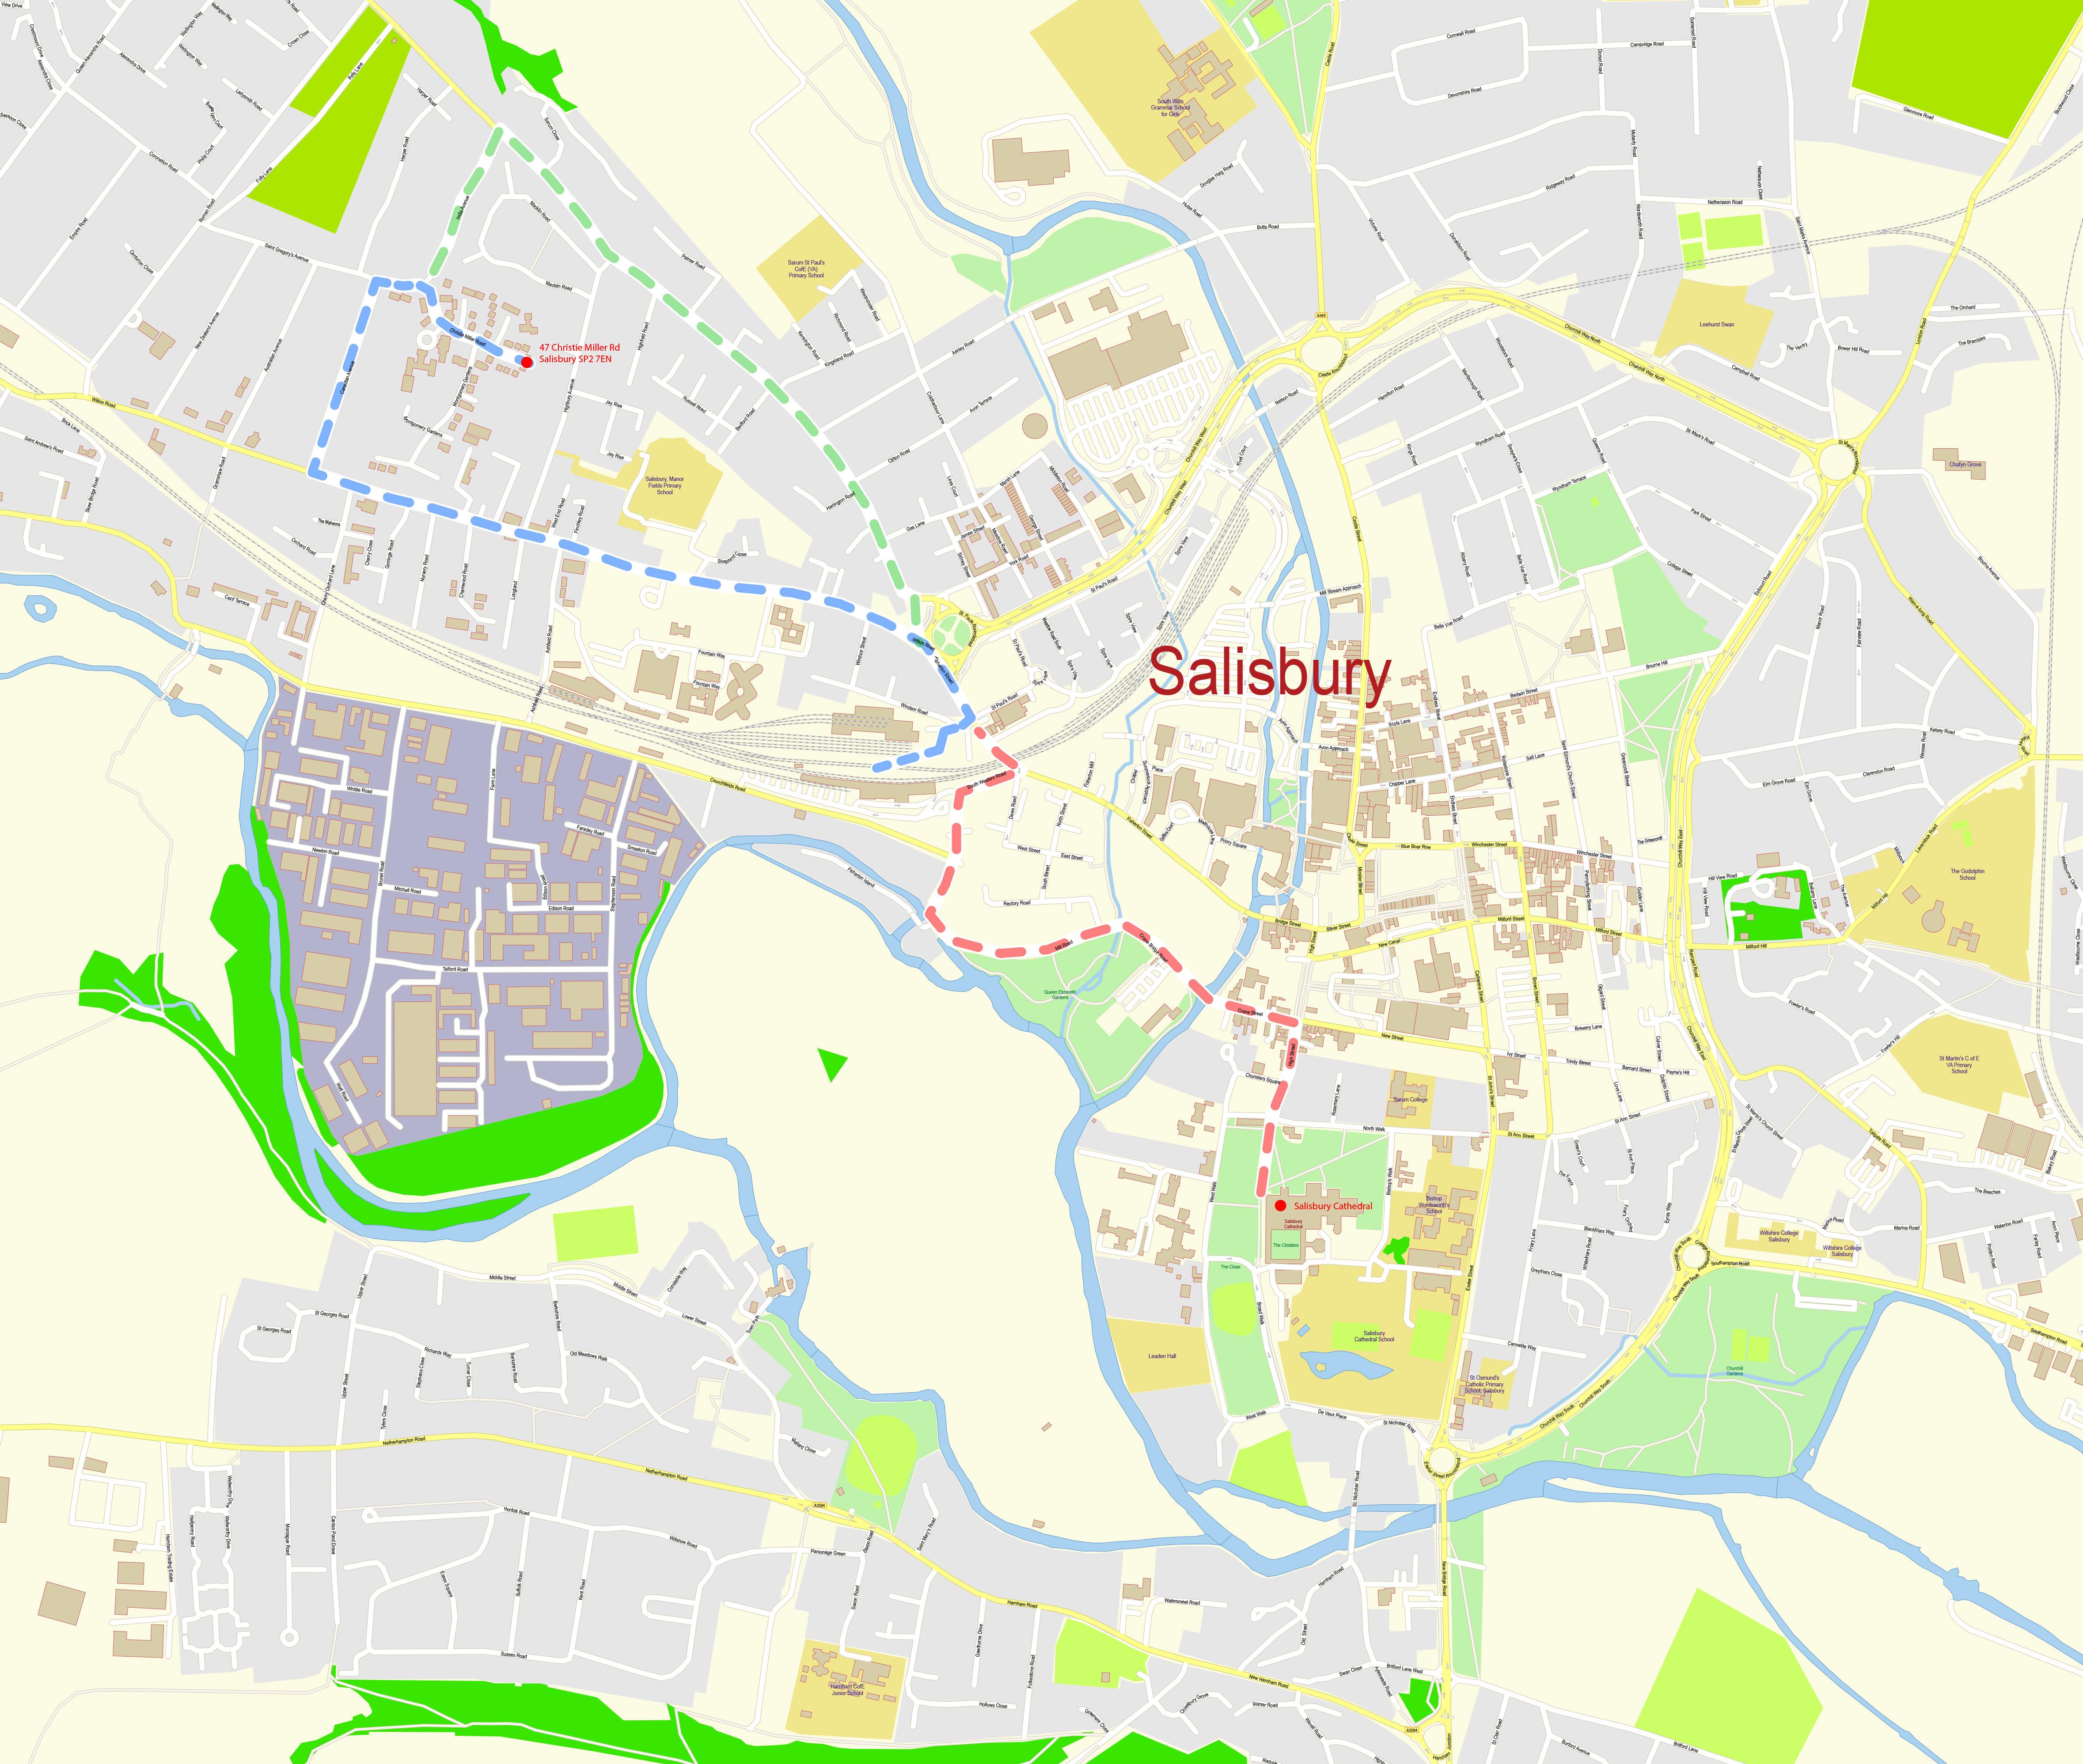 Map Of Salisbury File:Crime salisbury city street map pdf.   Wikimedia Commons